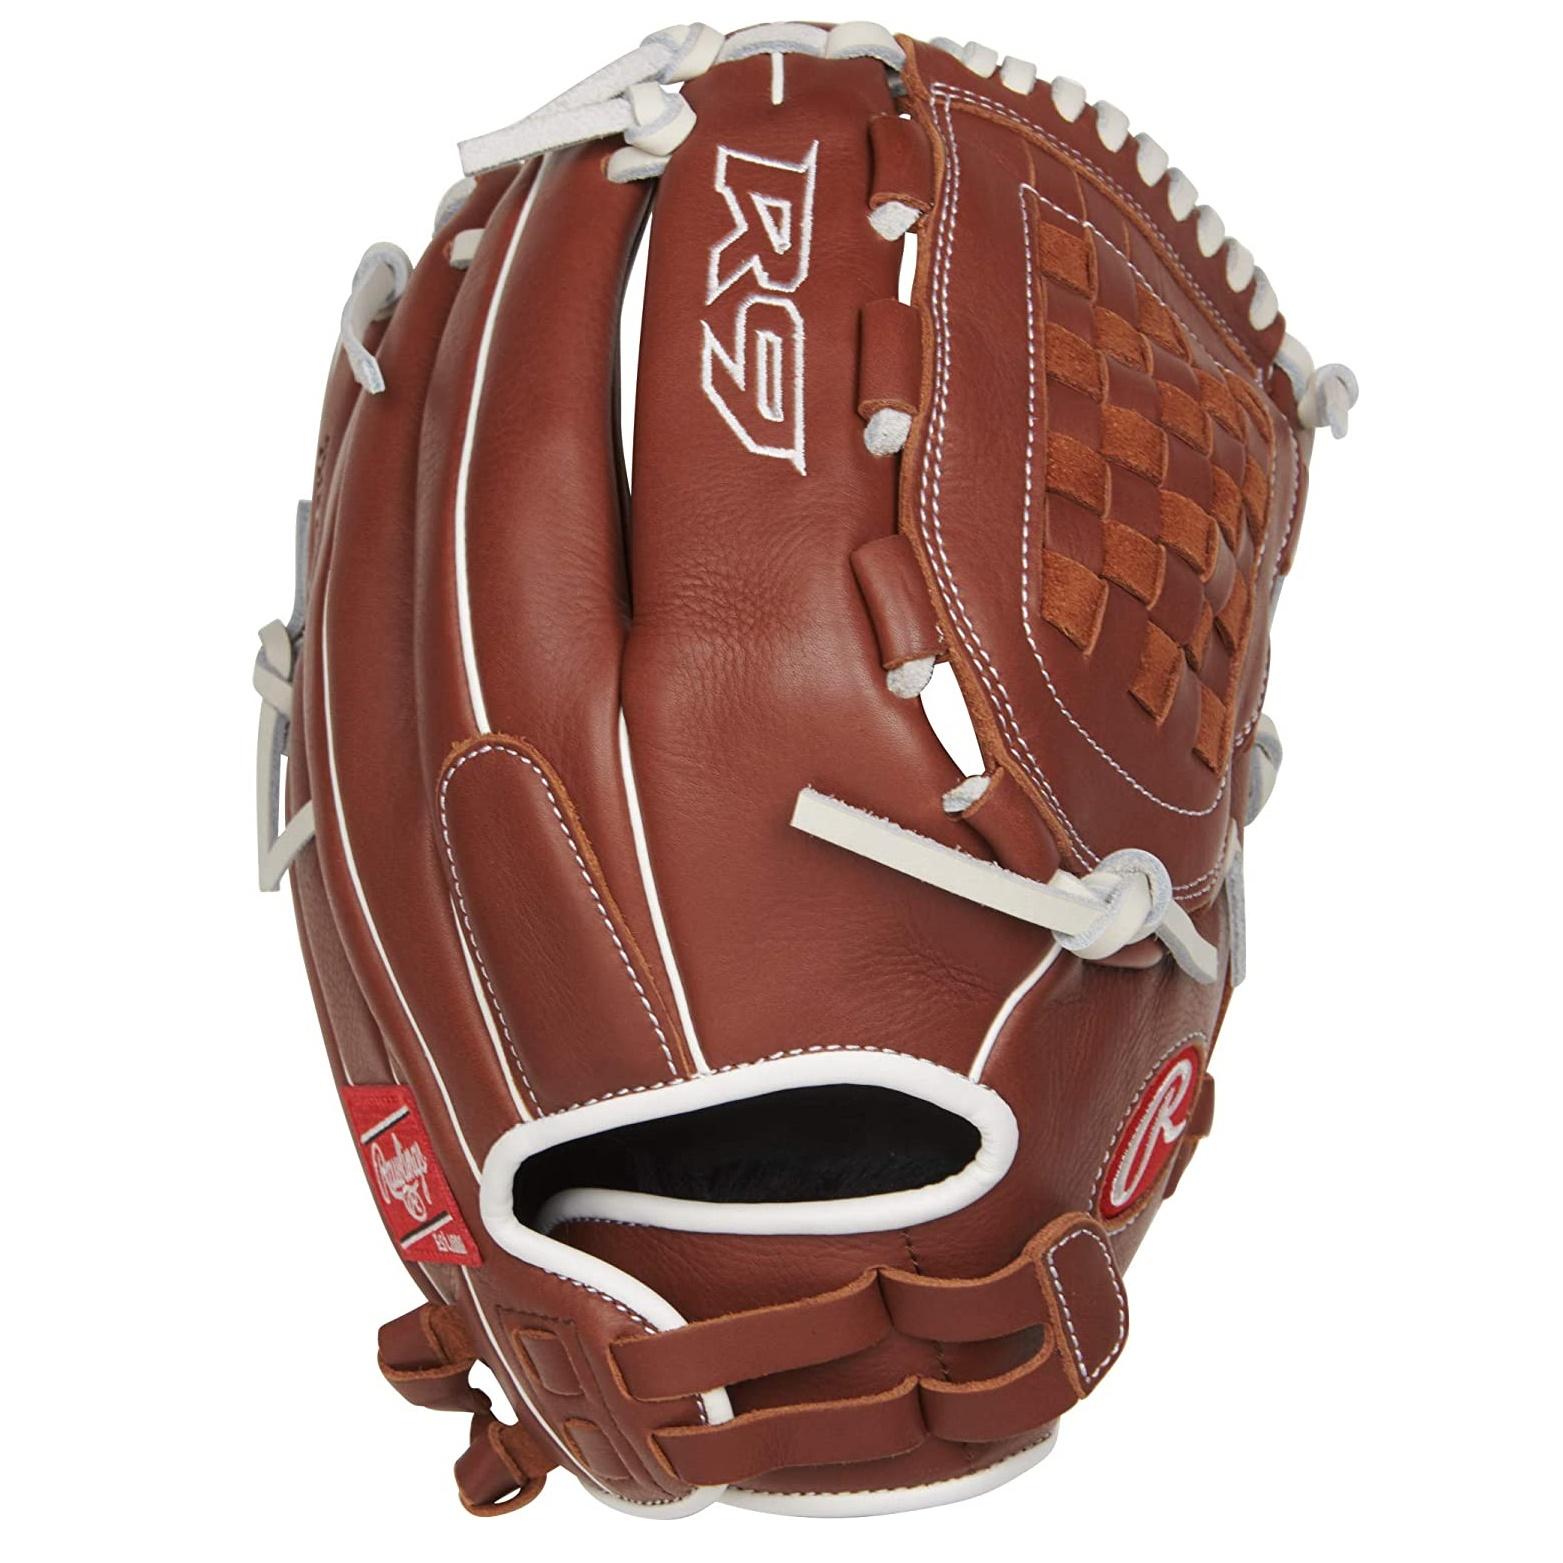 rawlings-r9-series-finger-shift-fastpitch-softball-glove-12-5-right-hand-throw R9SB125FS-3DB-RightHandThrow   The all new R9 Series softball gloves are the best gloves